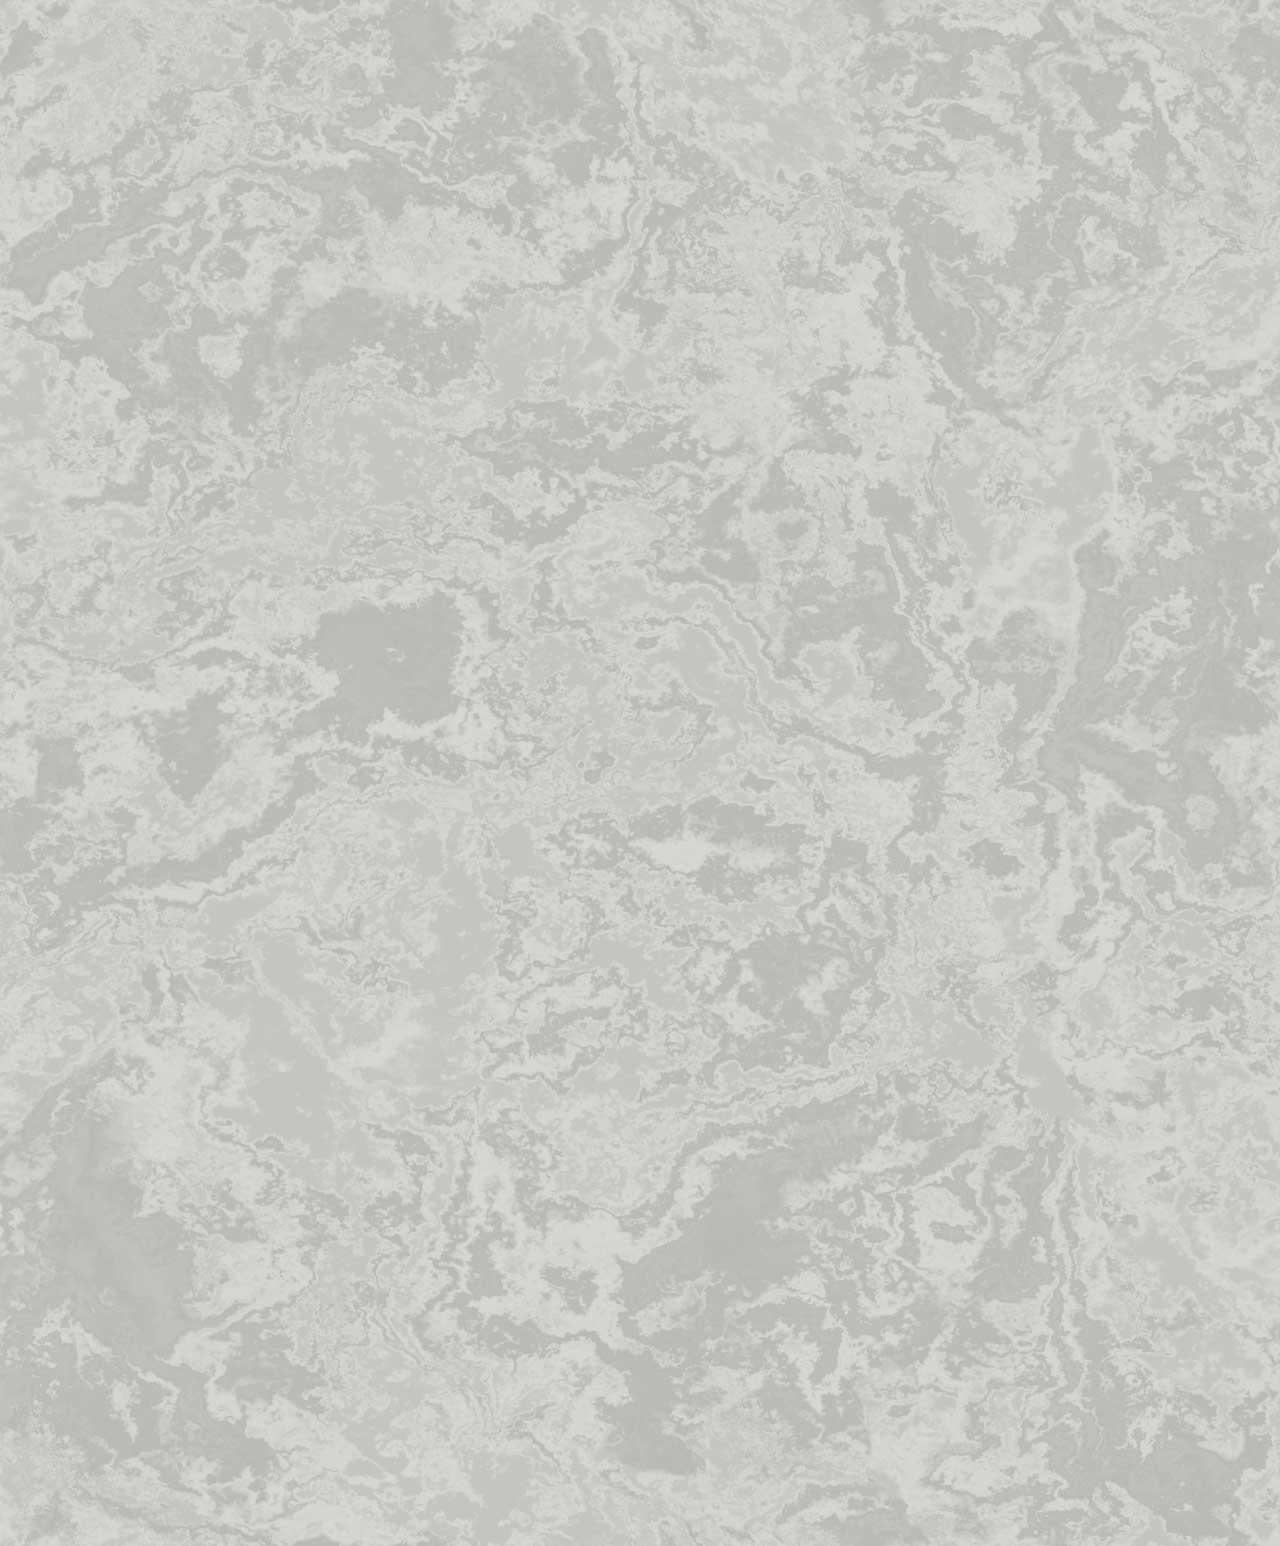 Capri-Luxury-Wallpaper-CP00706-CLOUD-MARBLE